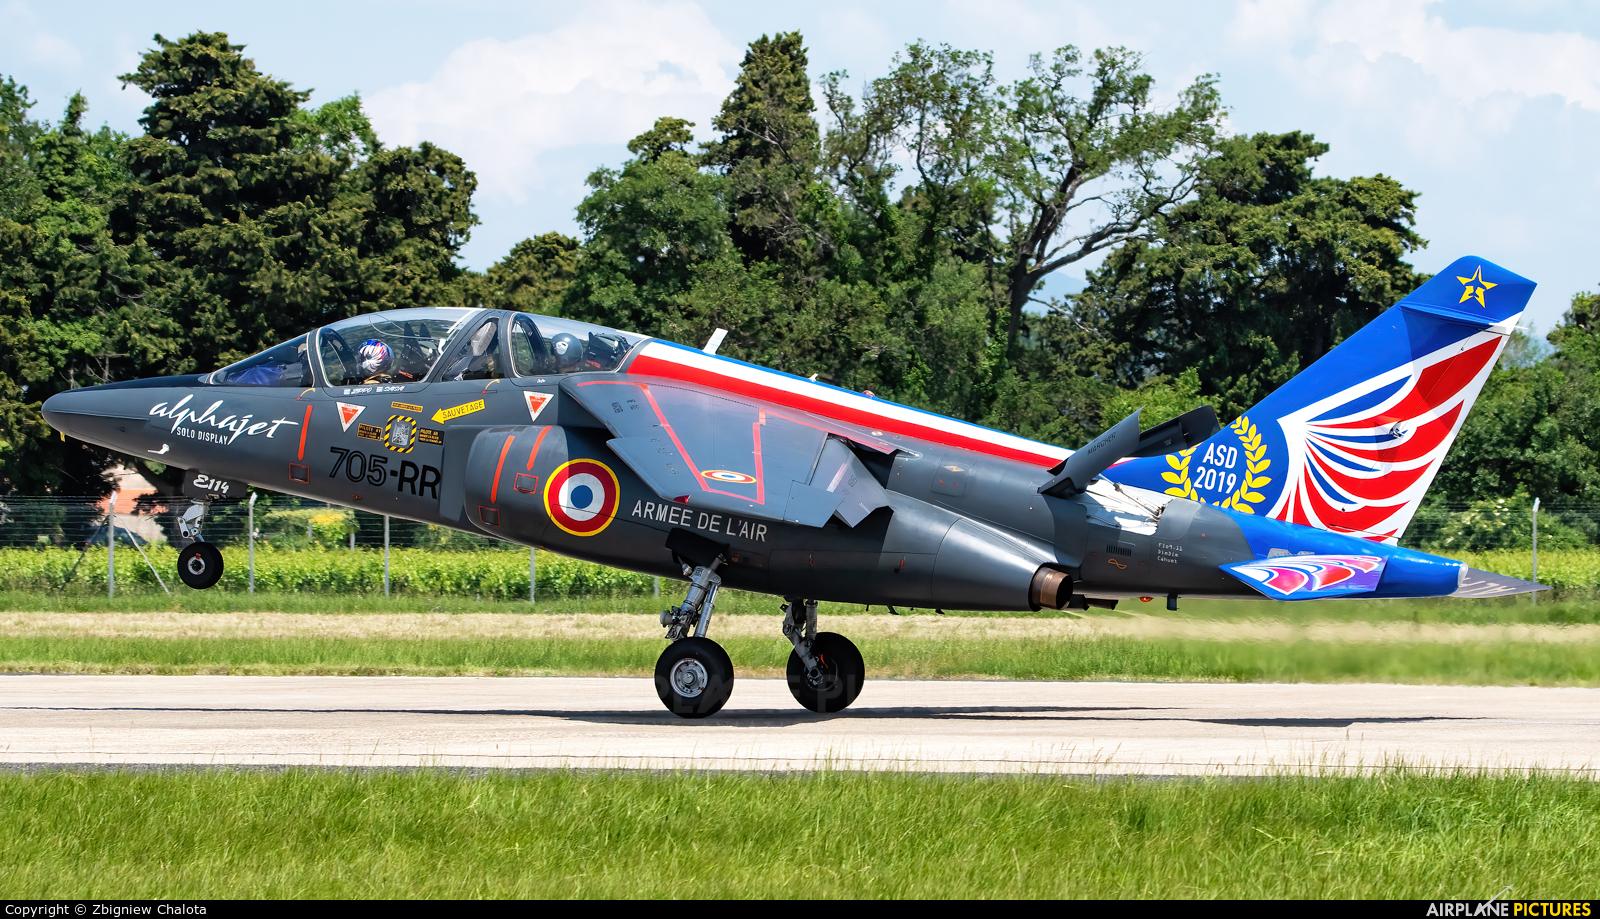 France - Air Force 705-RR aircraft at Orange - Caritat